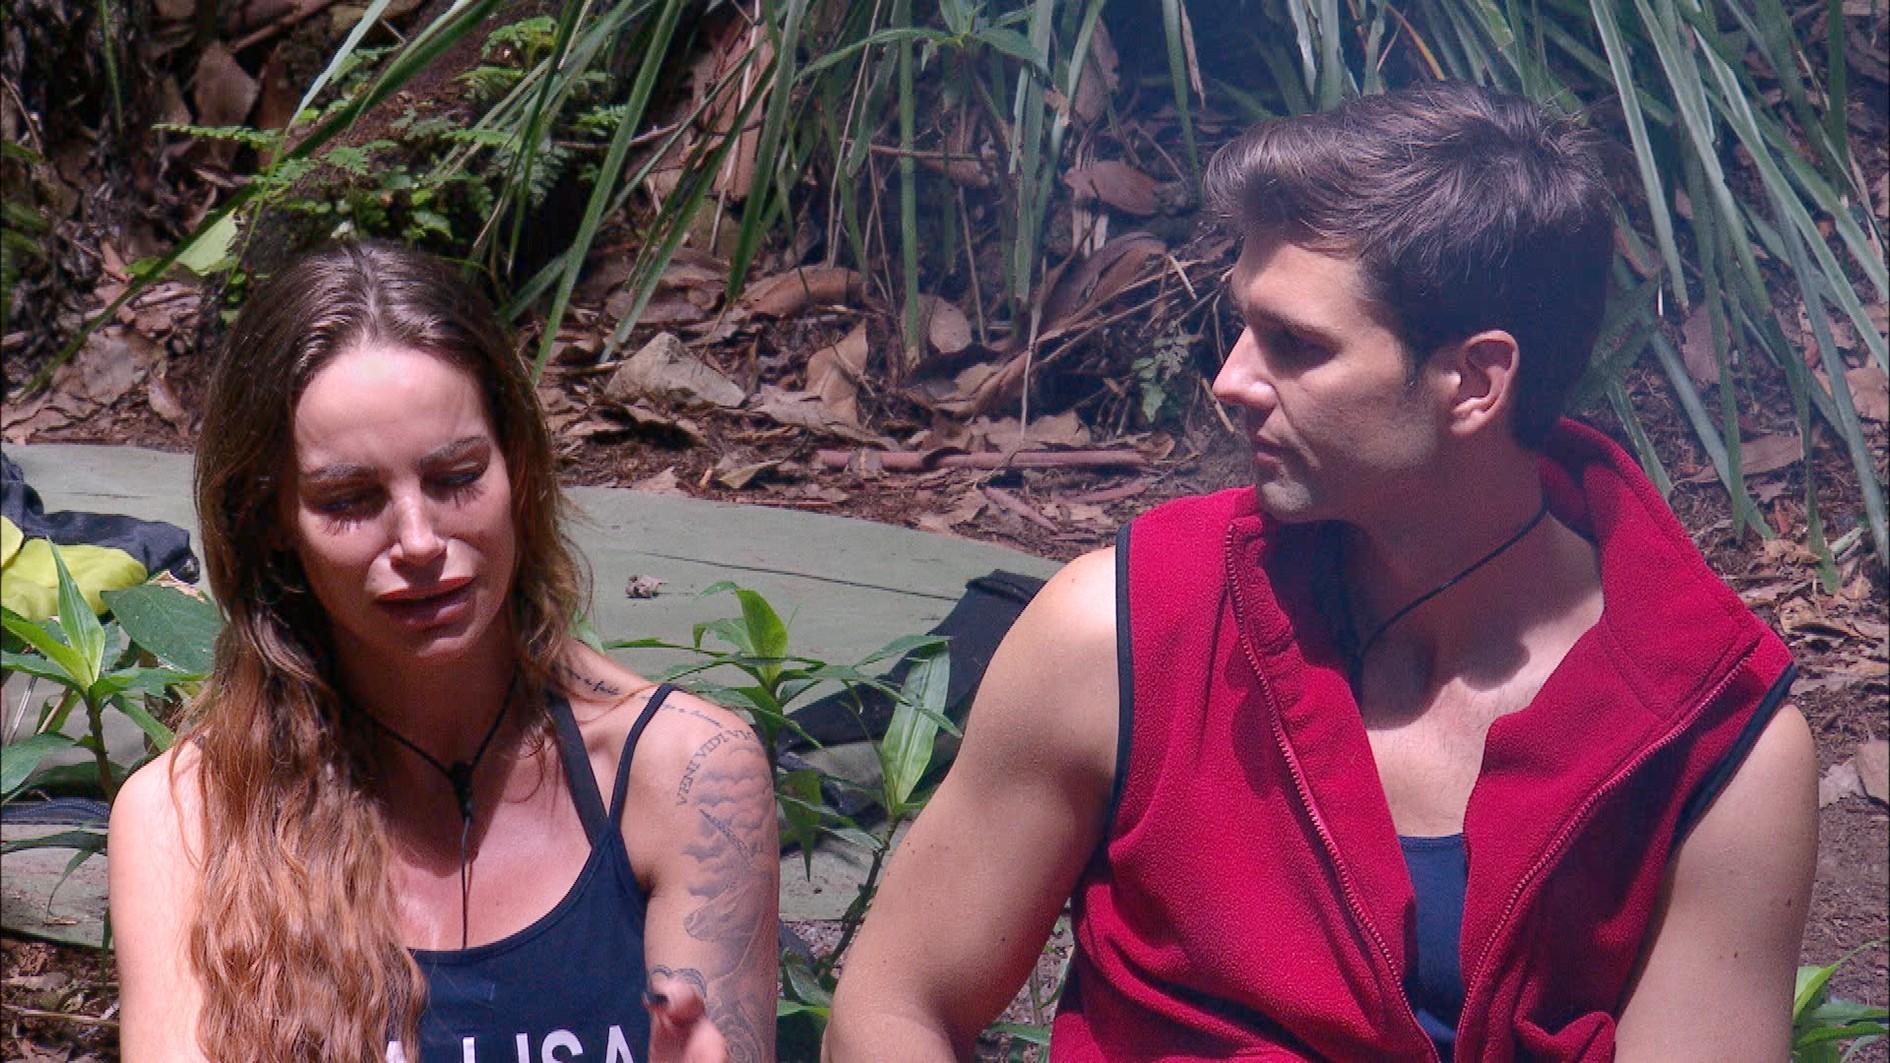 Dschungelcamp 2017: Gina-Lisa weint